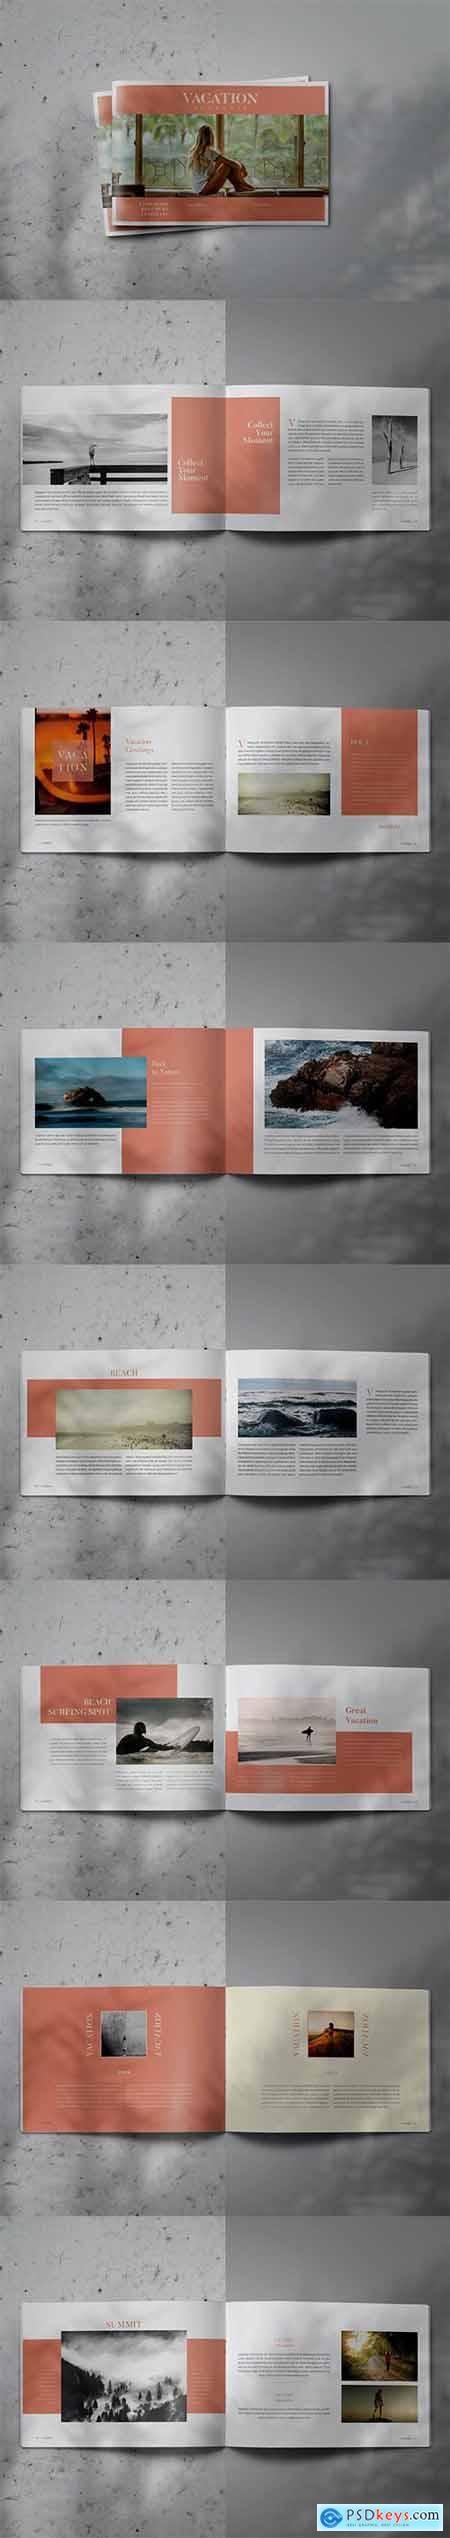 VACATION - Indesign Lookbook Brochure Template